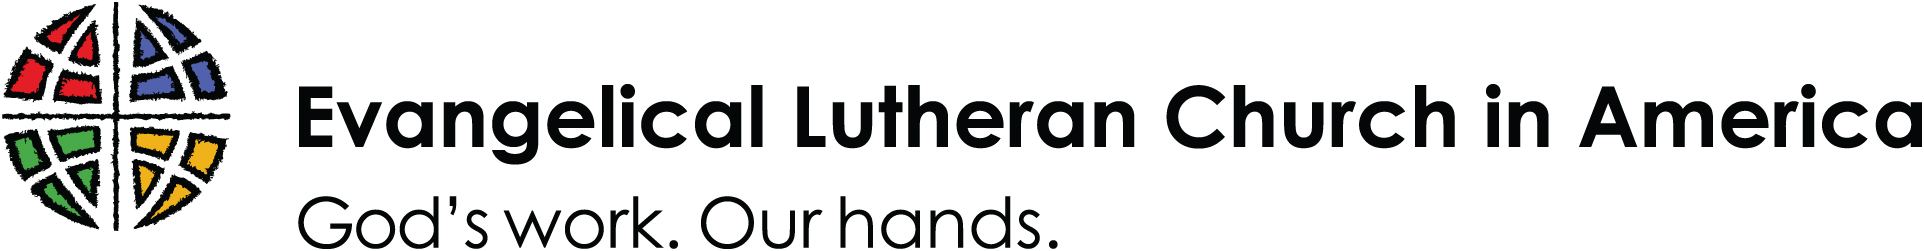 Evangelical Lutheran Church in America logo